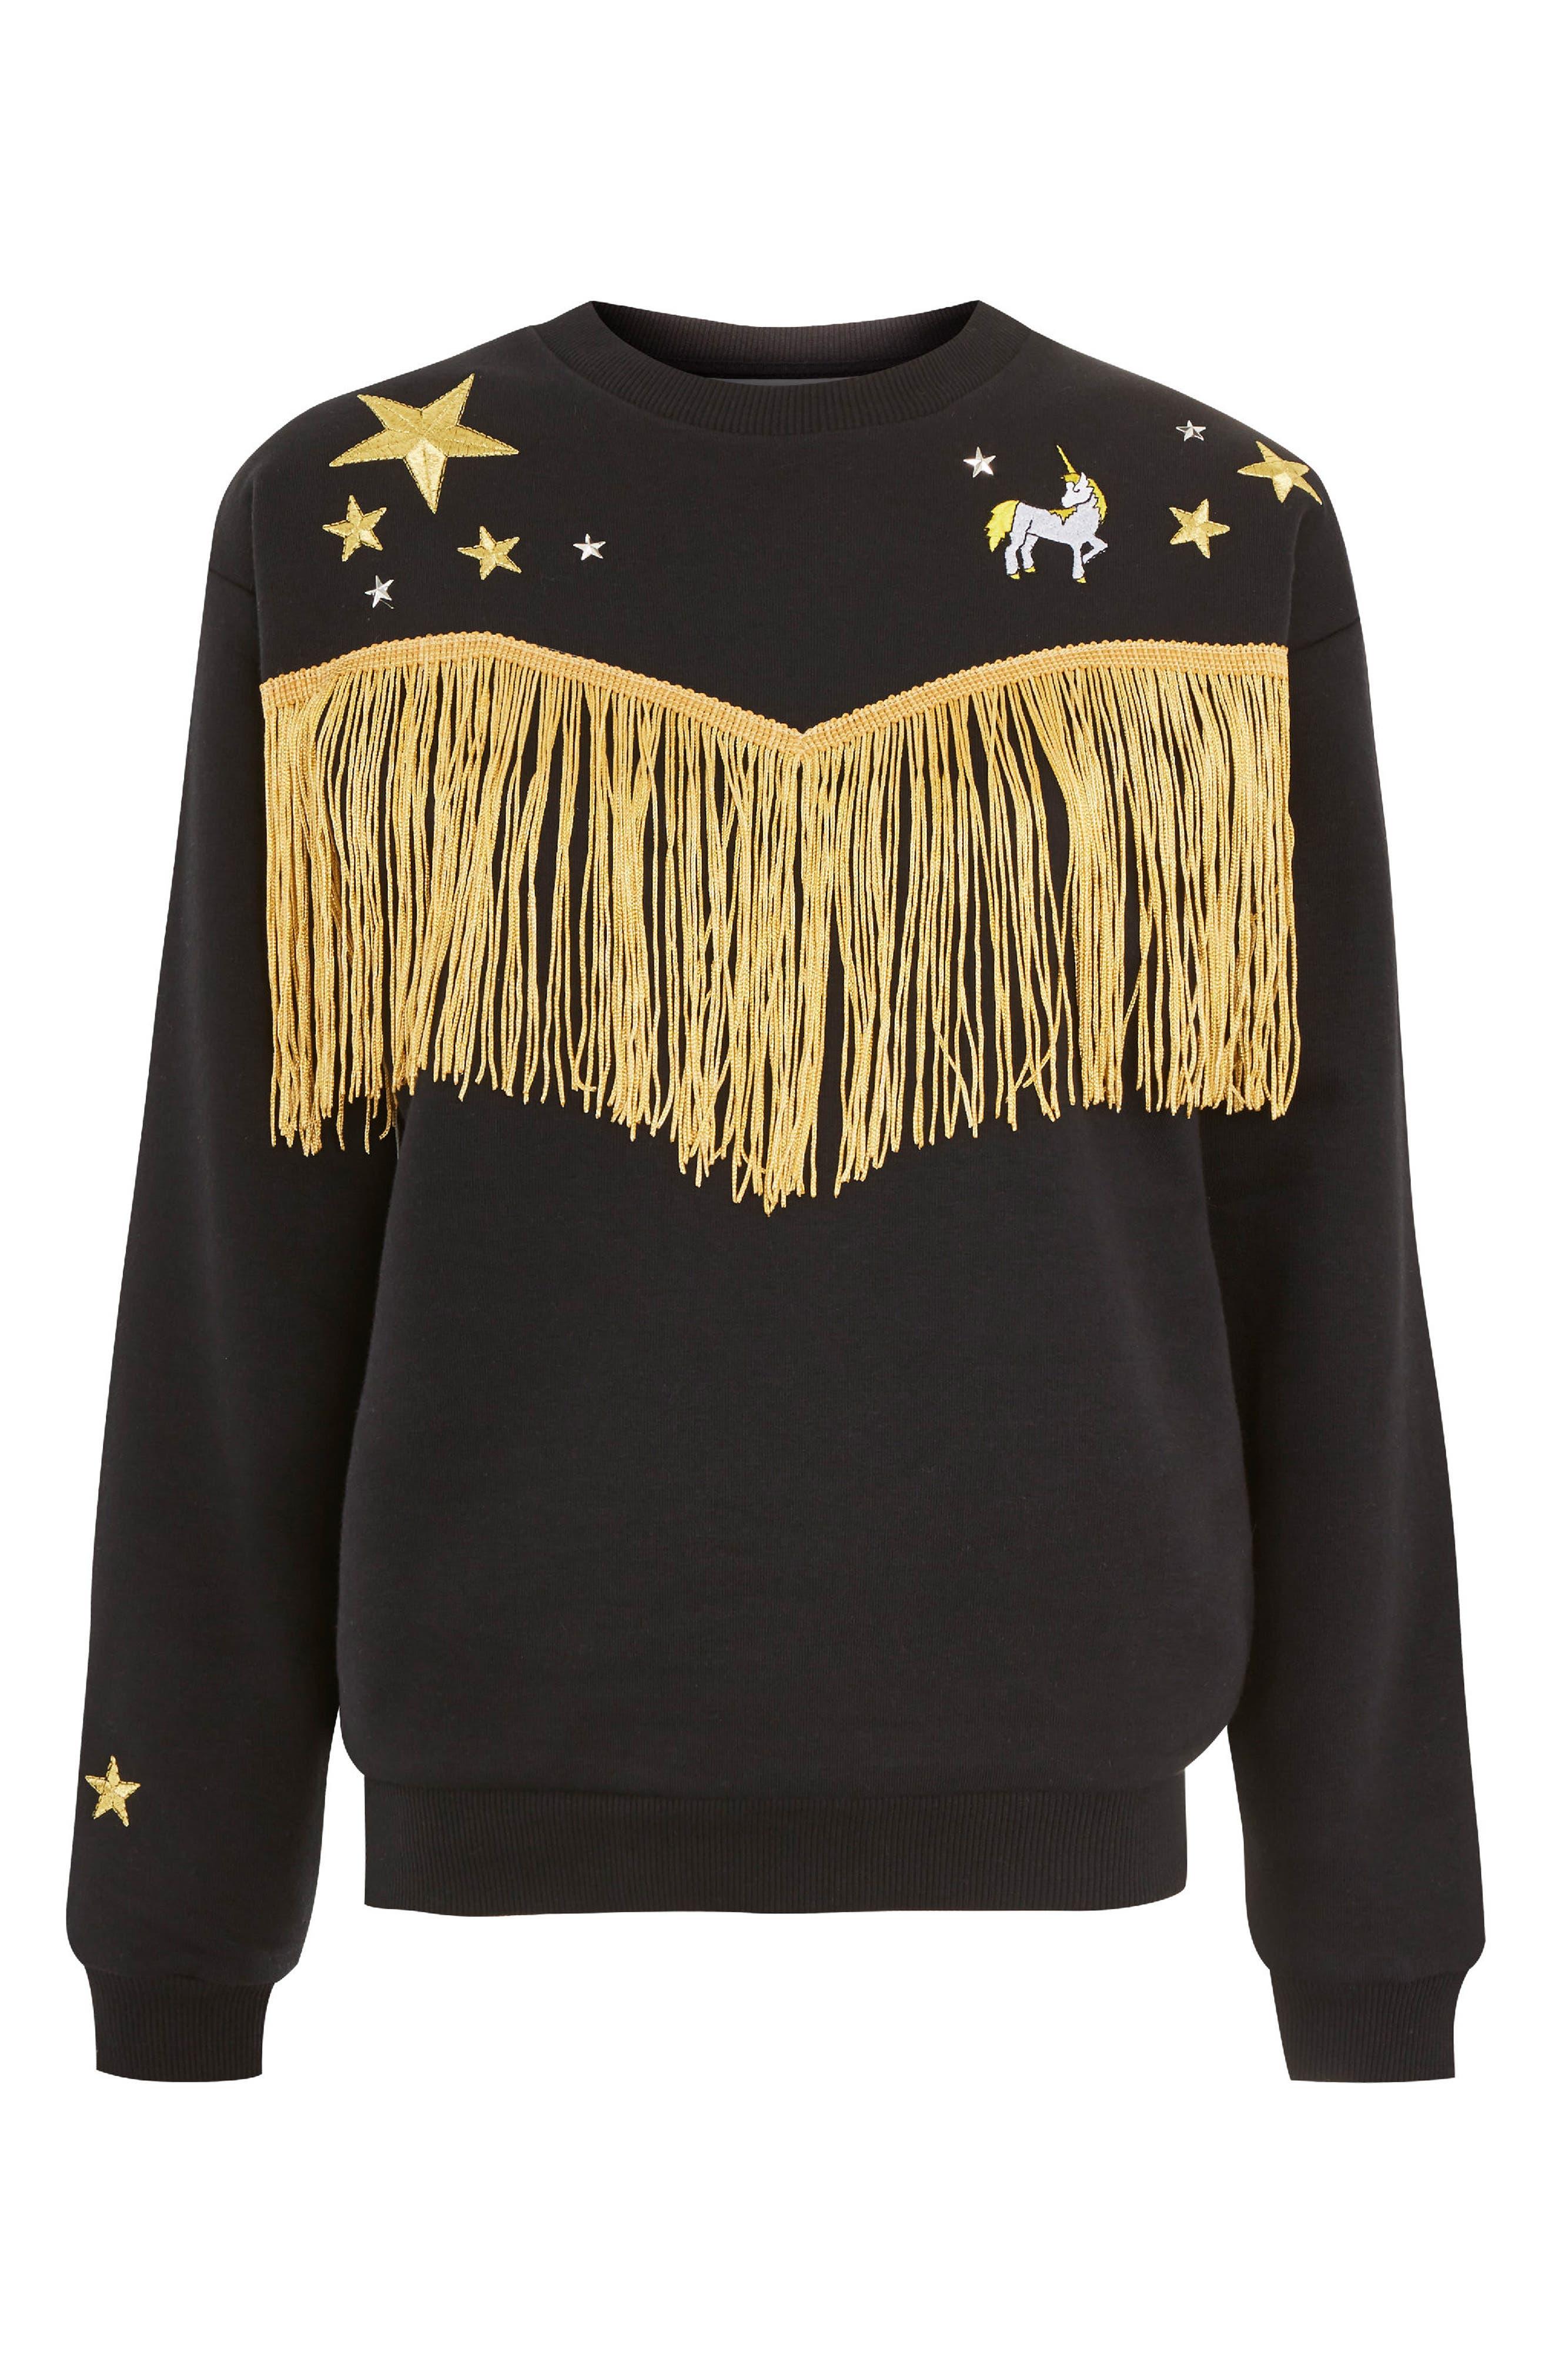 by Tee & Cake Western Fringe Sweatshirt,                             Alternate thumbnail 4, color,                             Black Multi